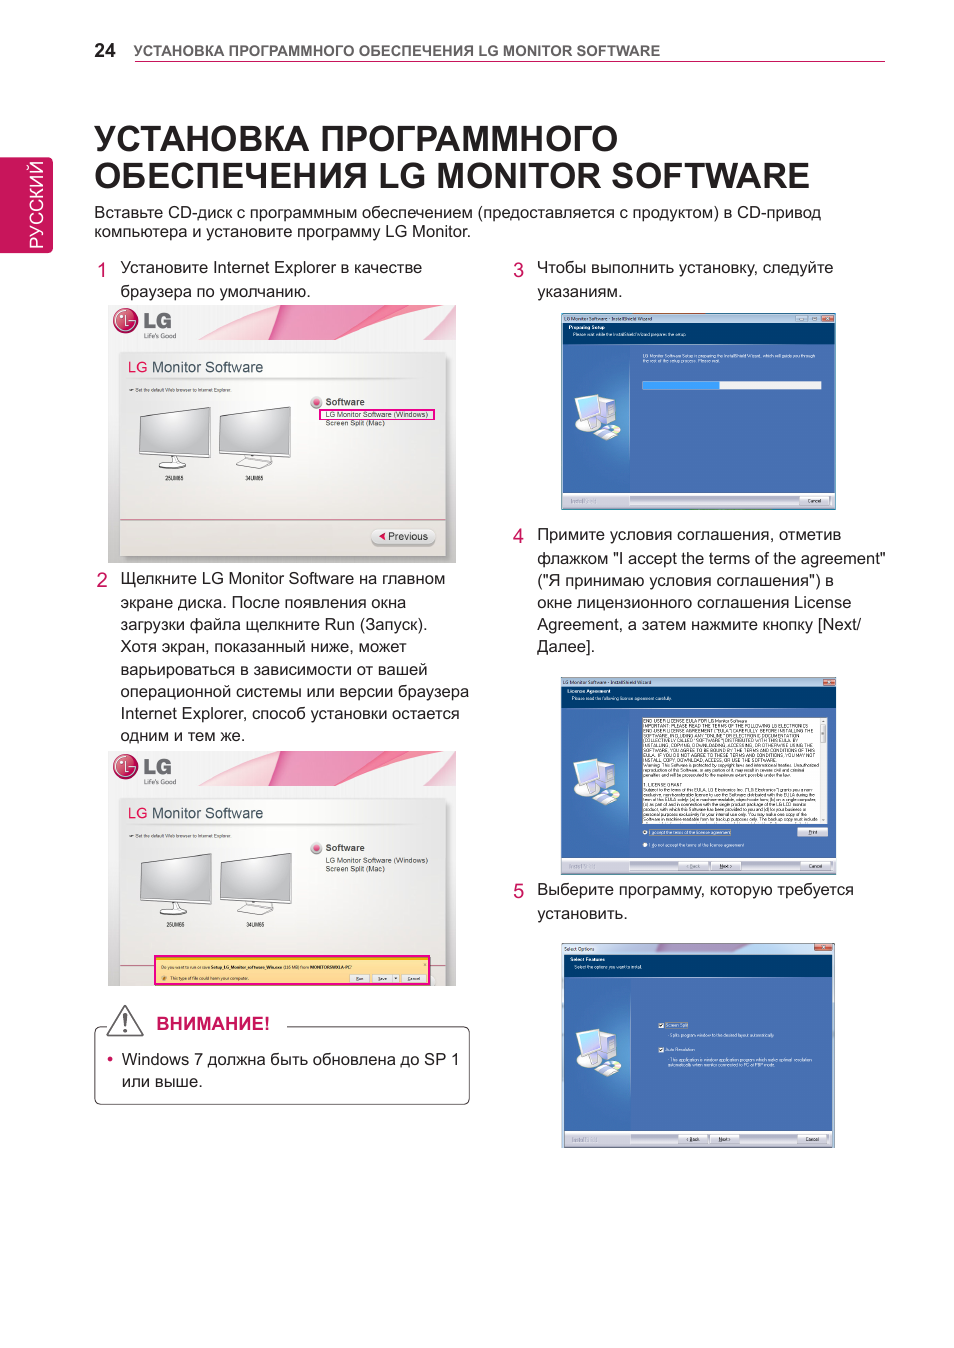 Установка, Программного, Обеспечения lg monitor | Инструкция